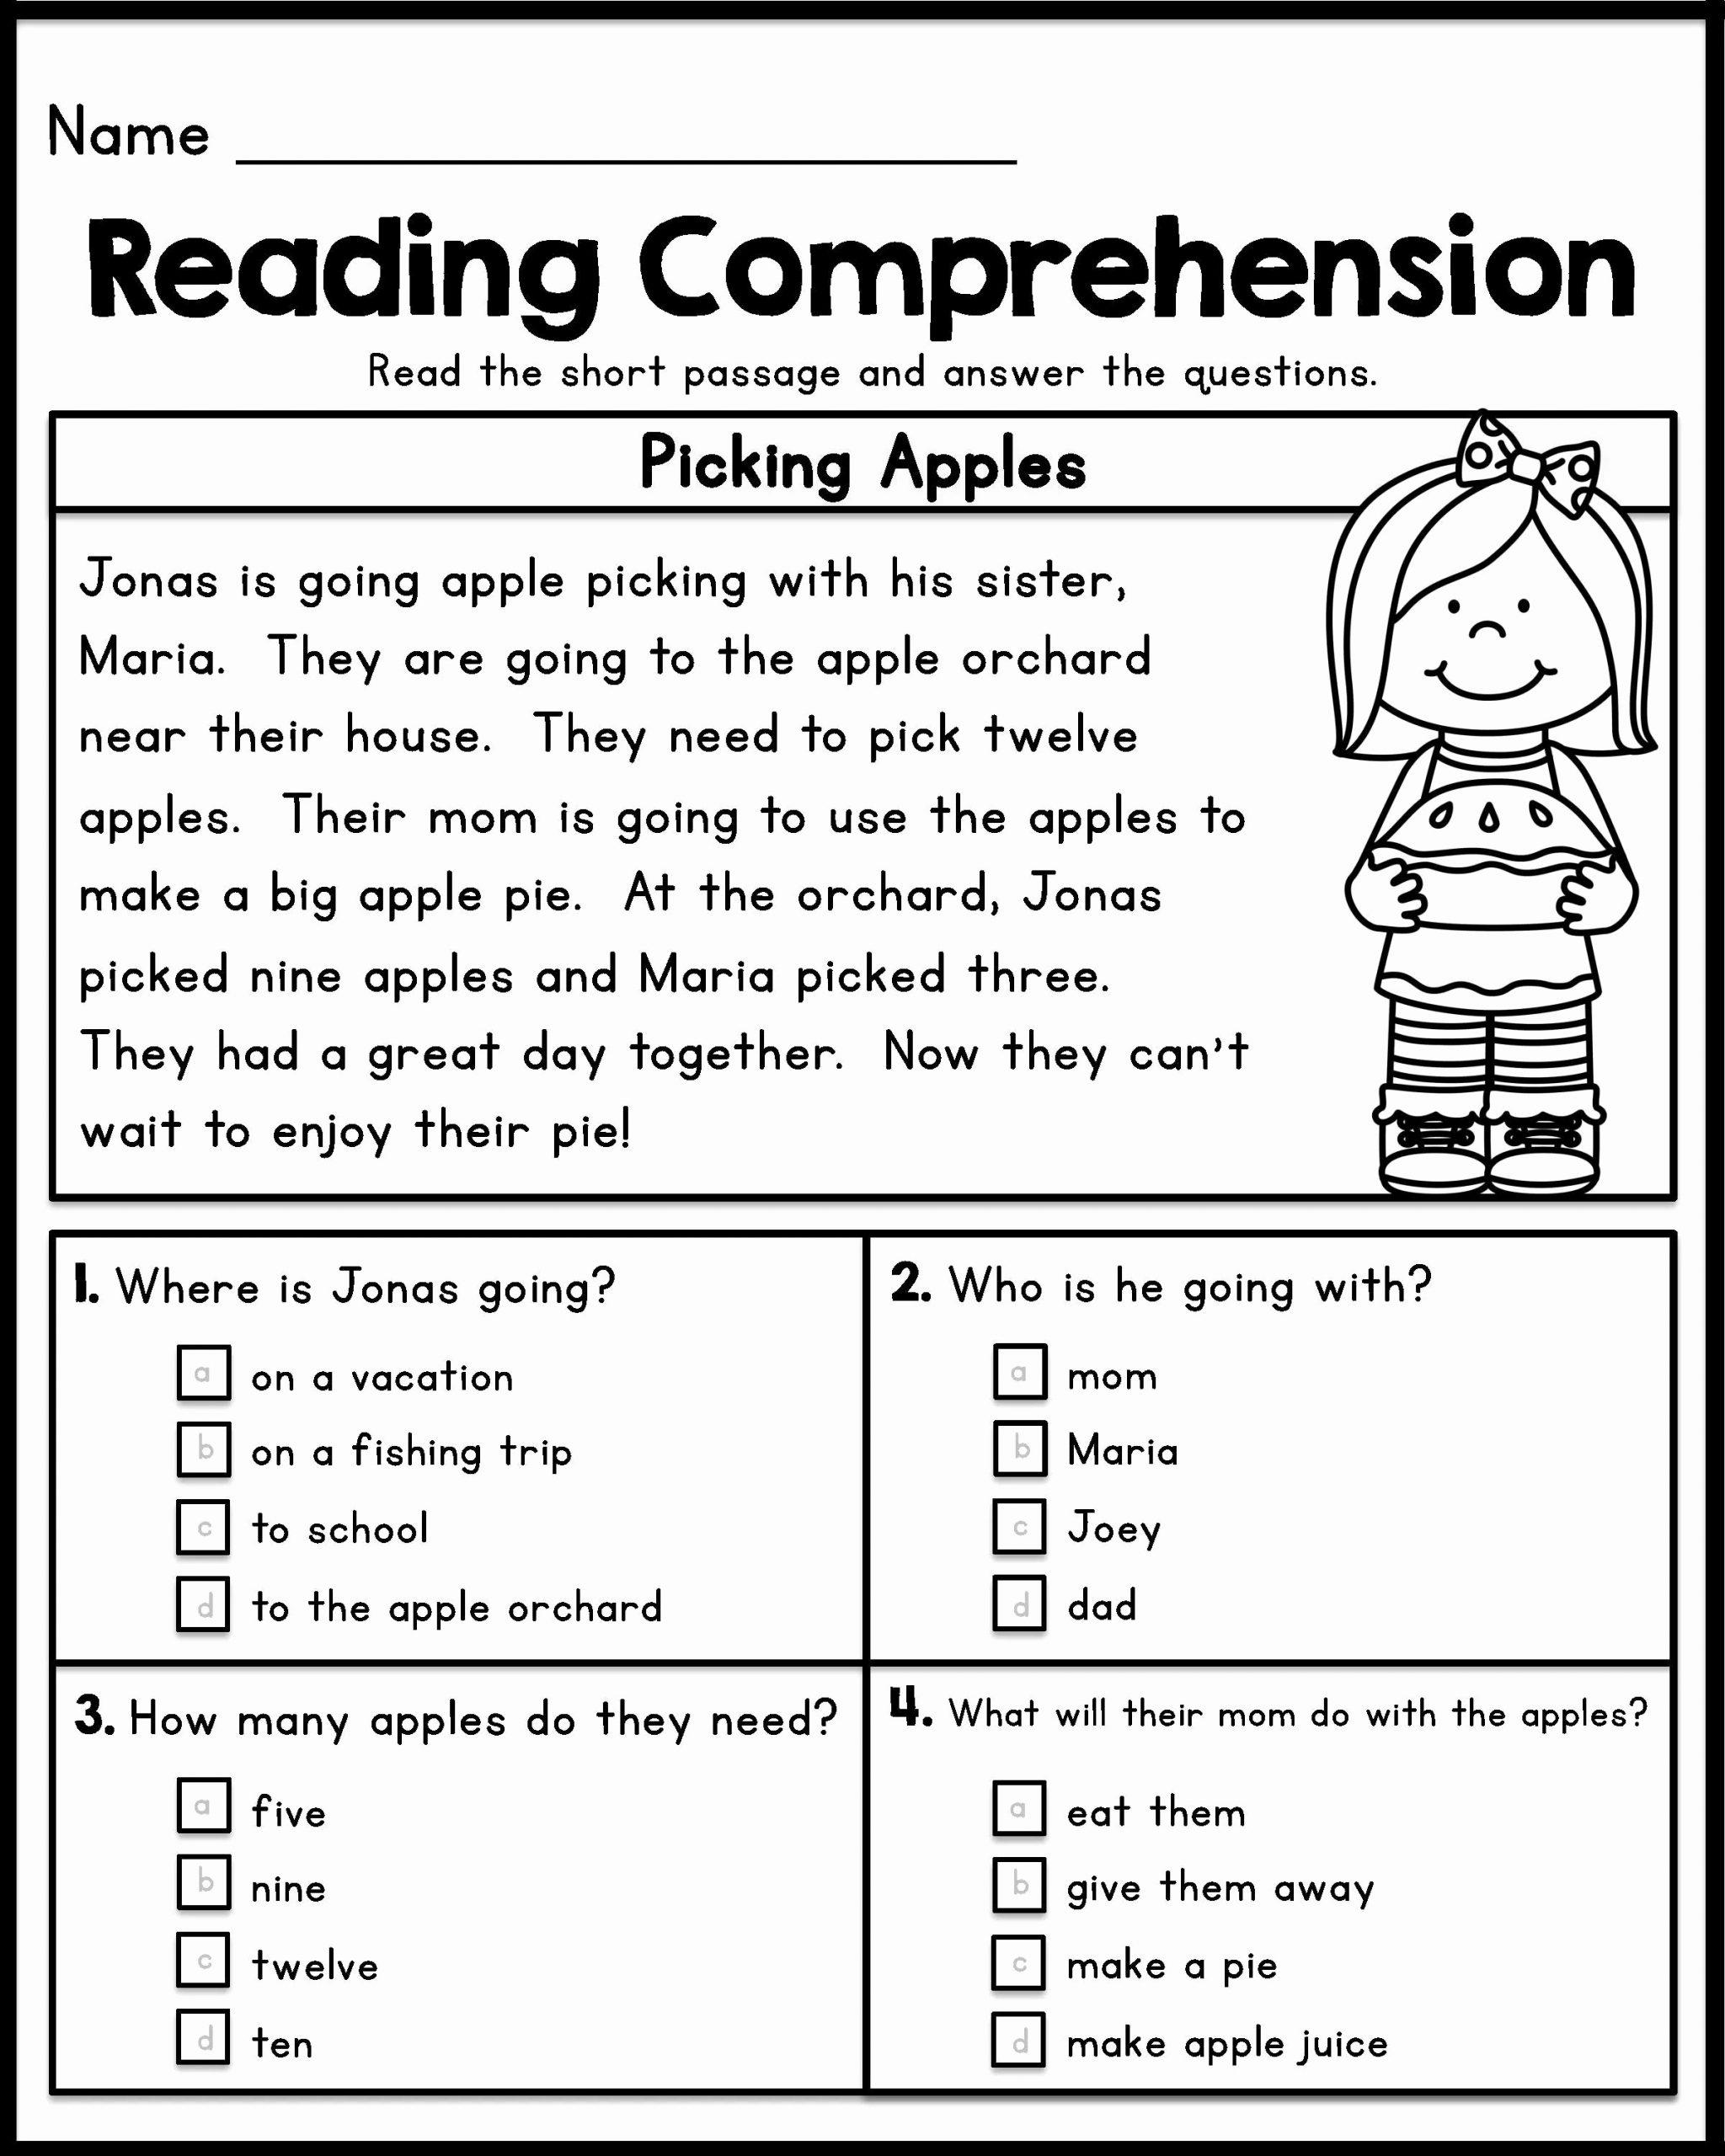 1st Grade Reading Worksheets Printable Luxury 1st Grade Reading Prehension Worksheets Pdf for